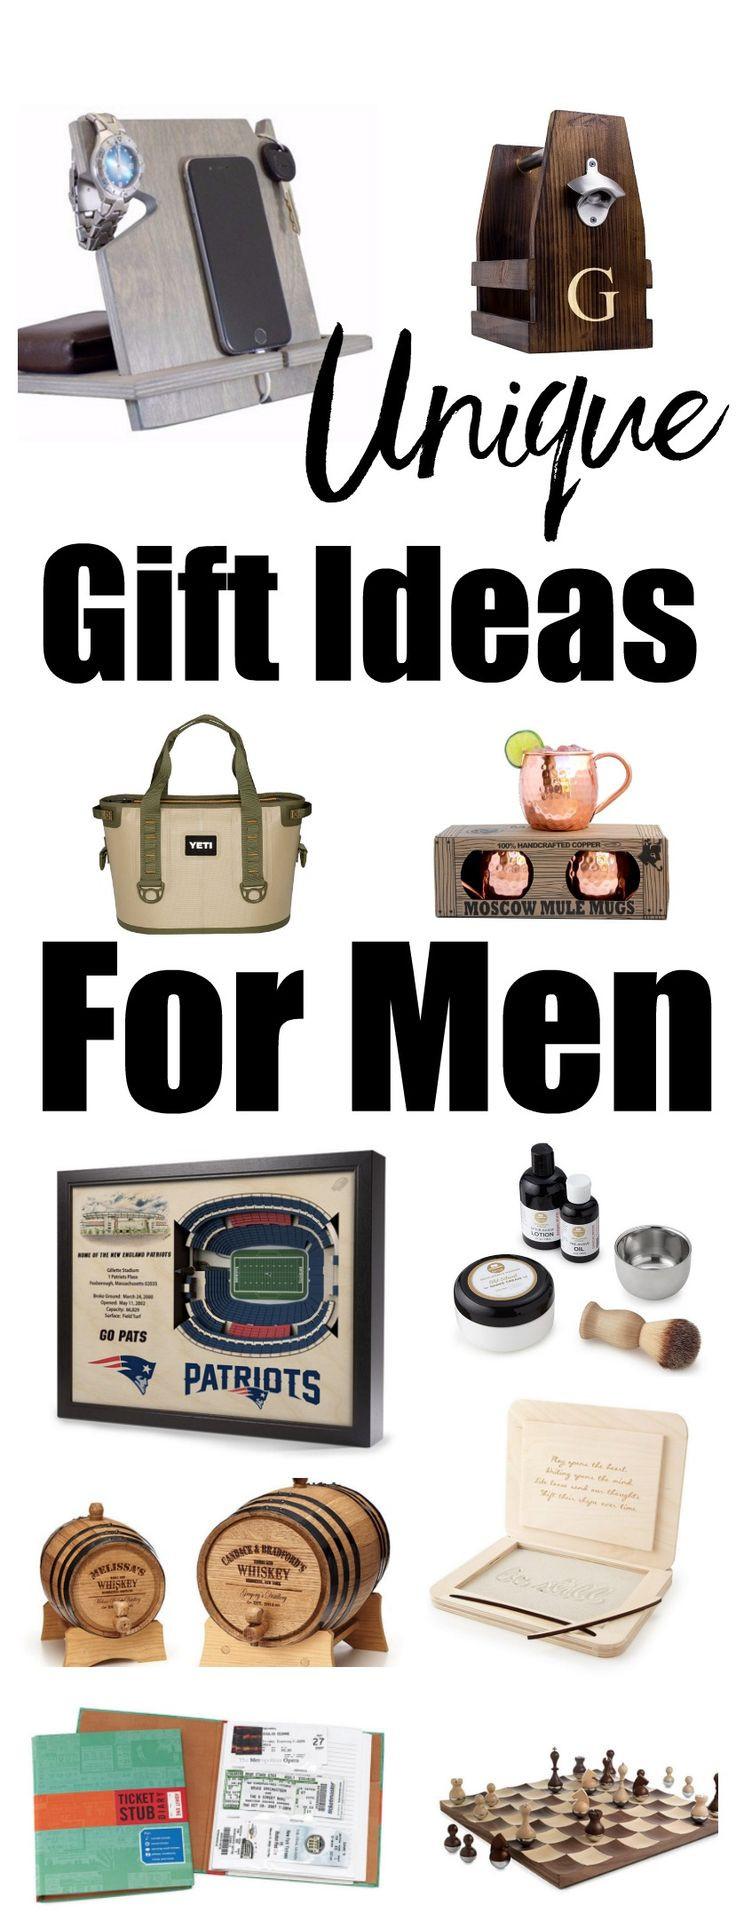 Birthday Gift Ideas For Men  Unique Gift Ideas for Men Christmas Ideas